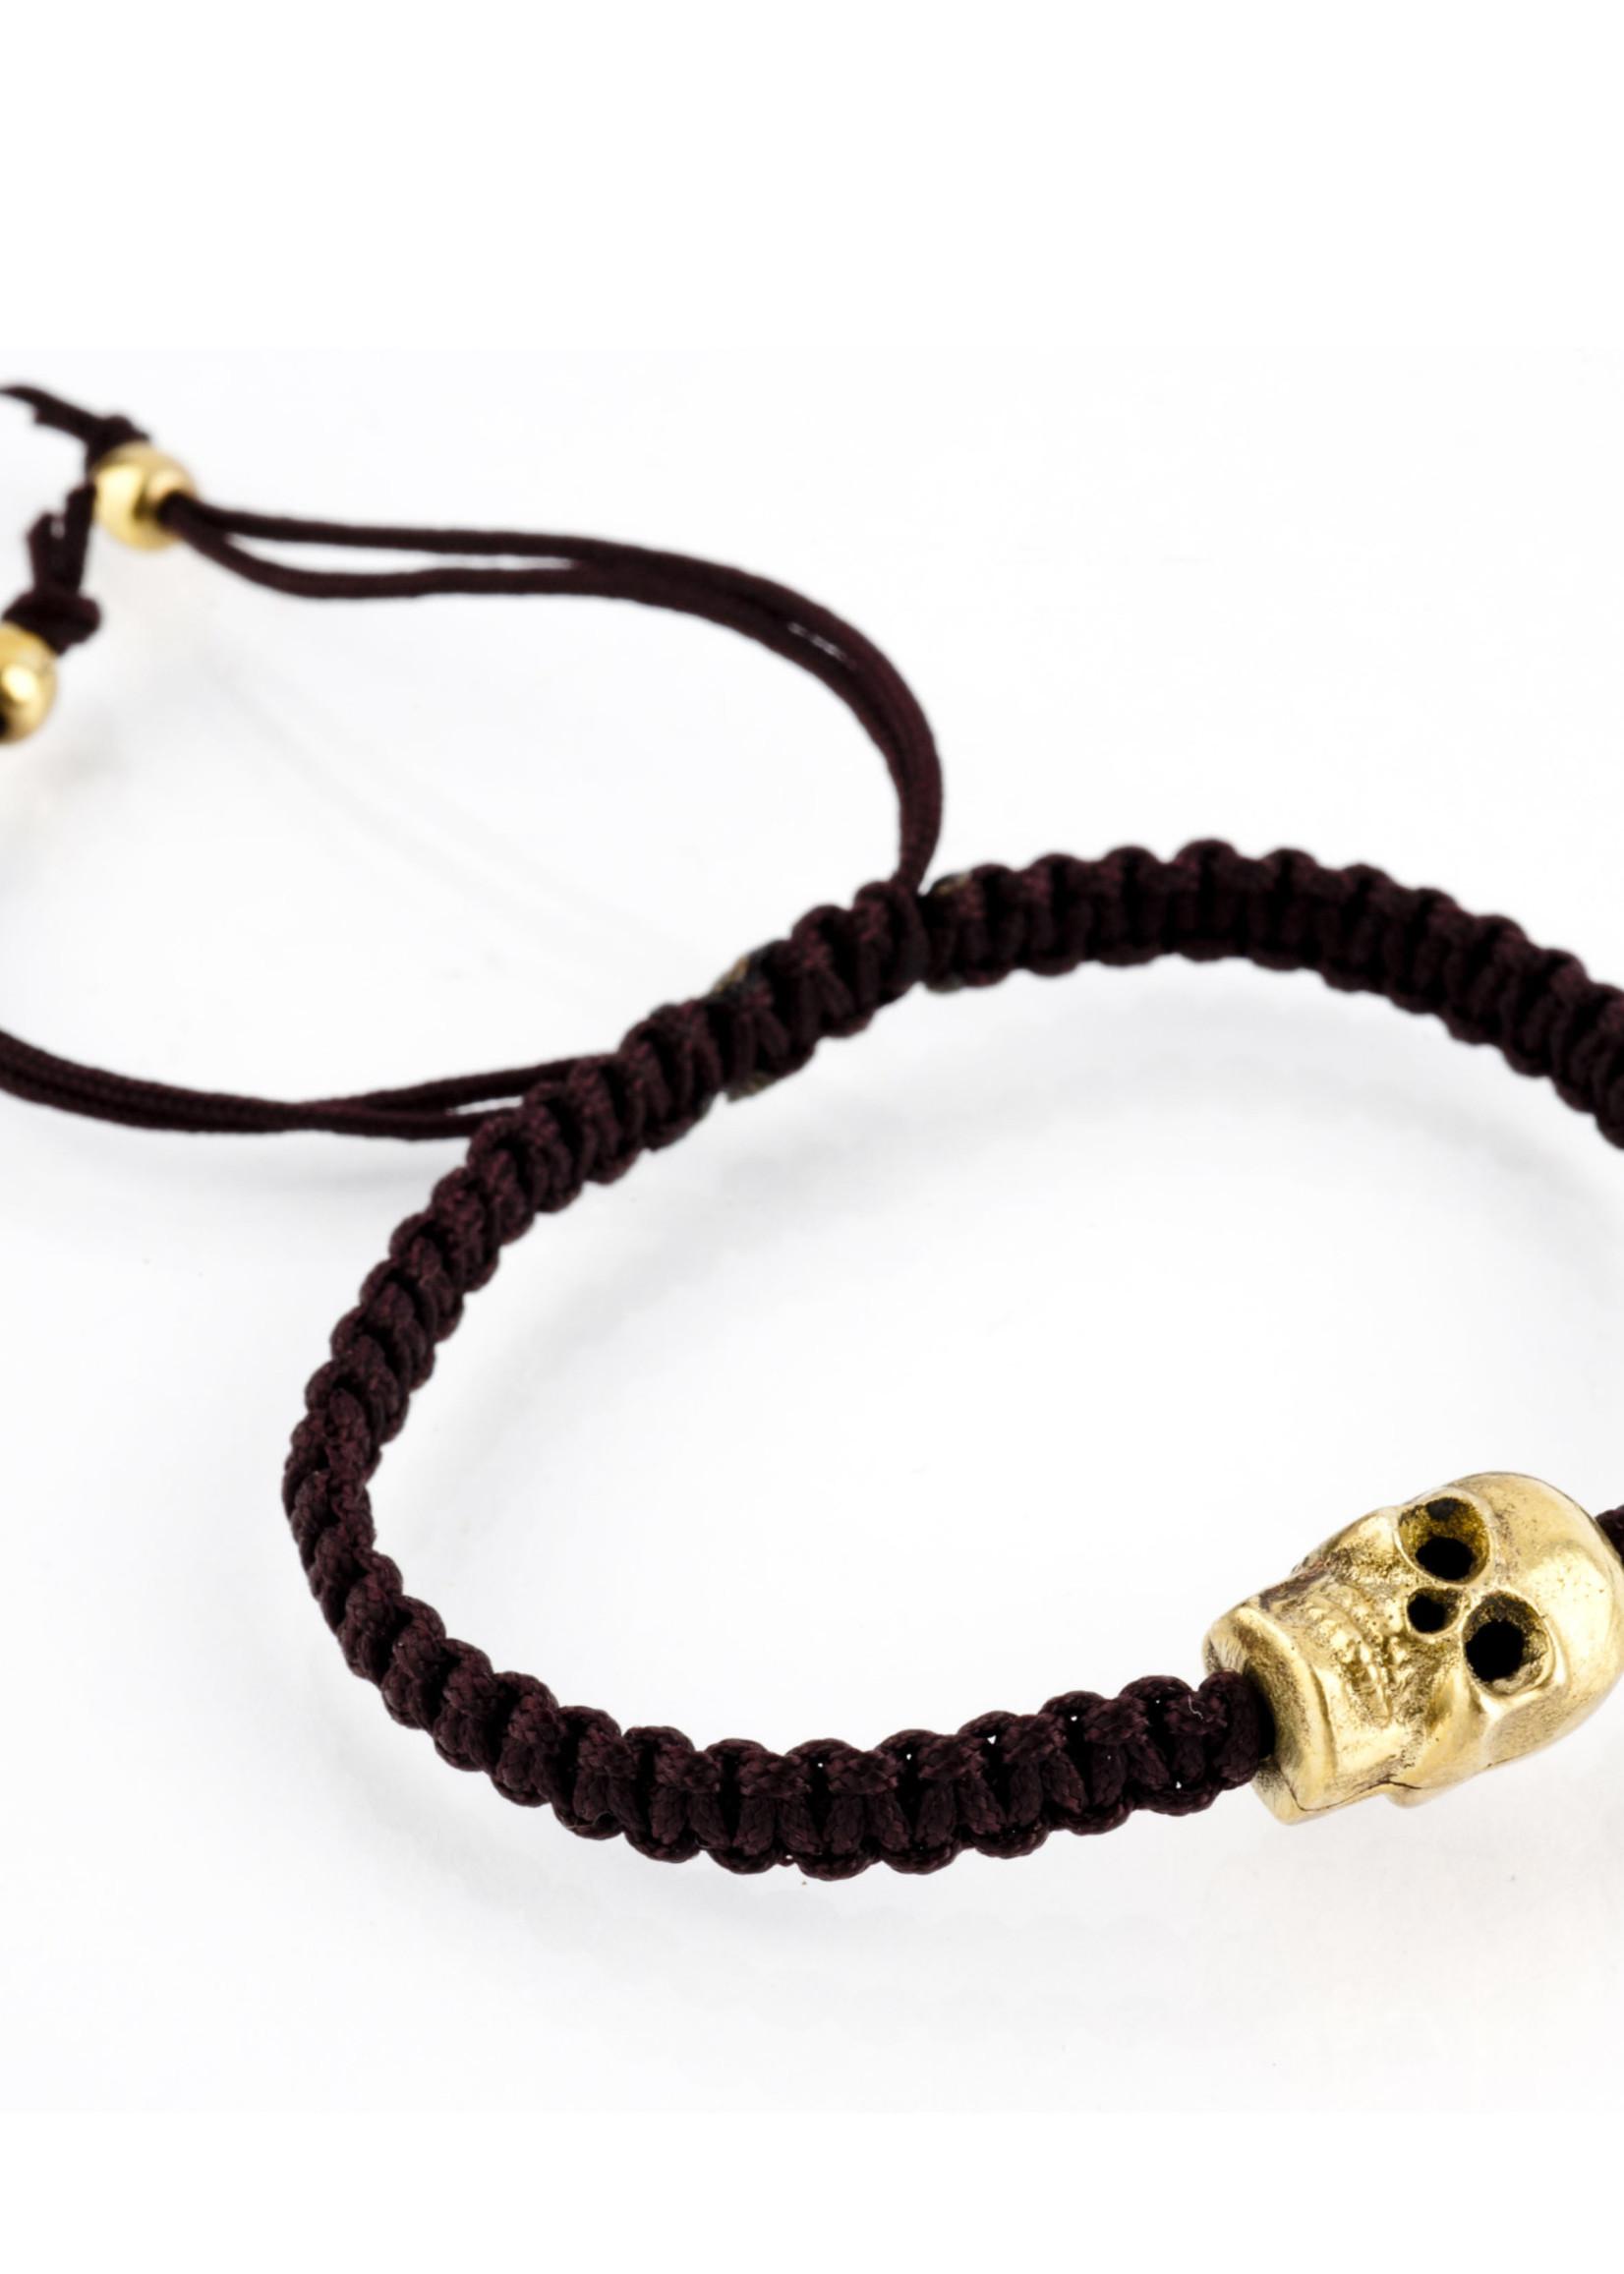 Mina Danielle Brown Macramé with gold skull